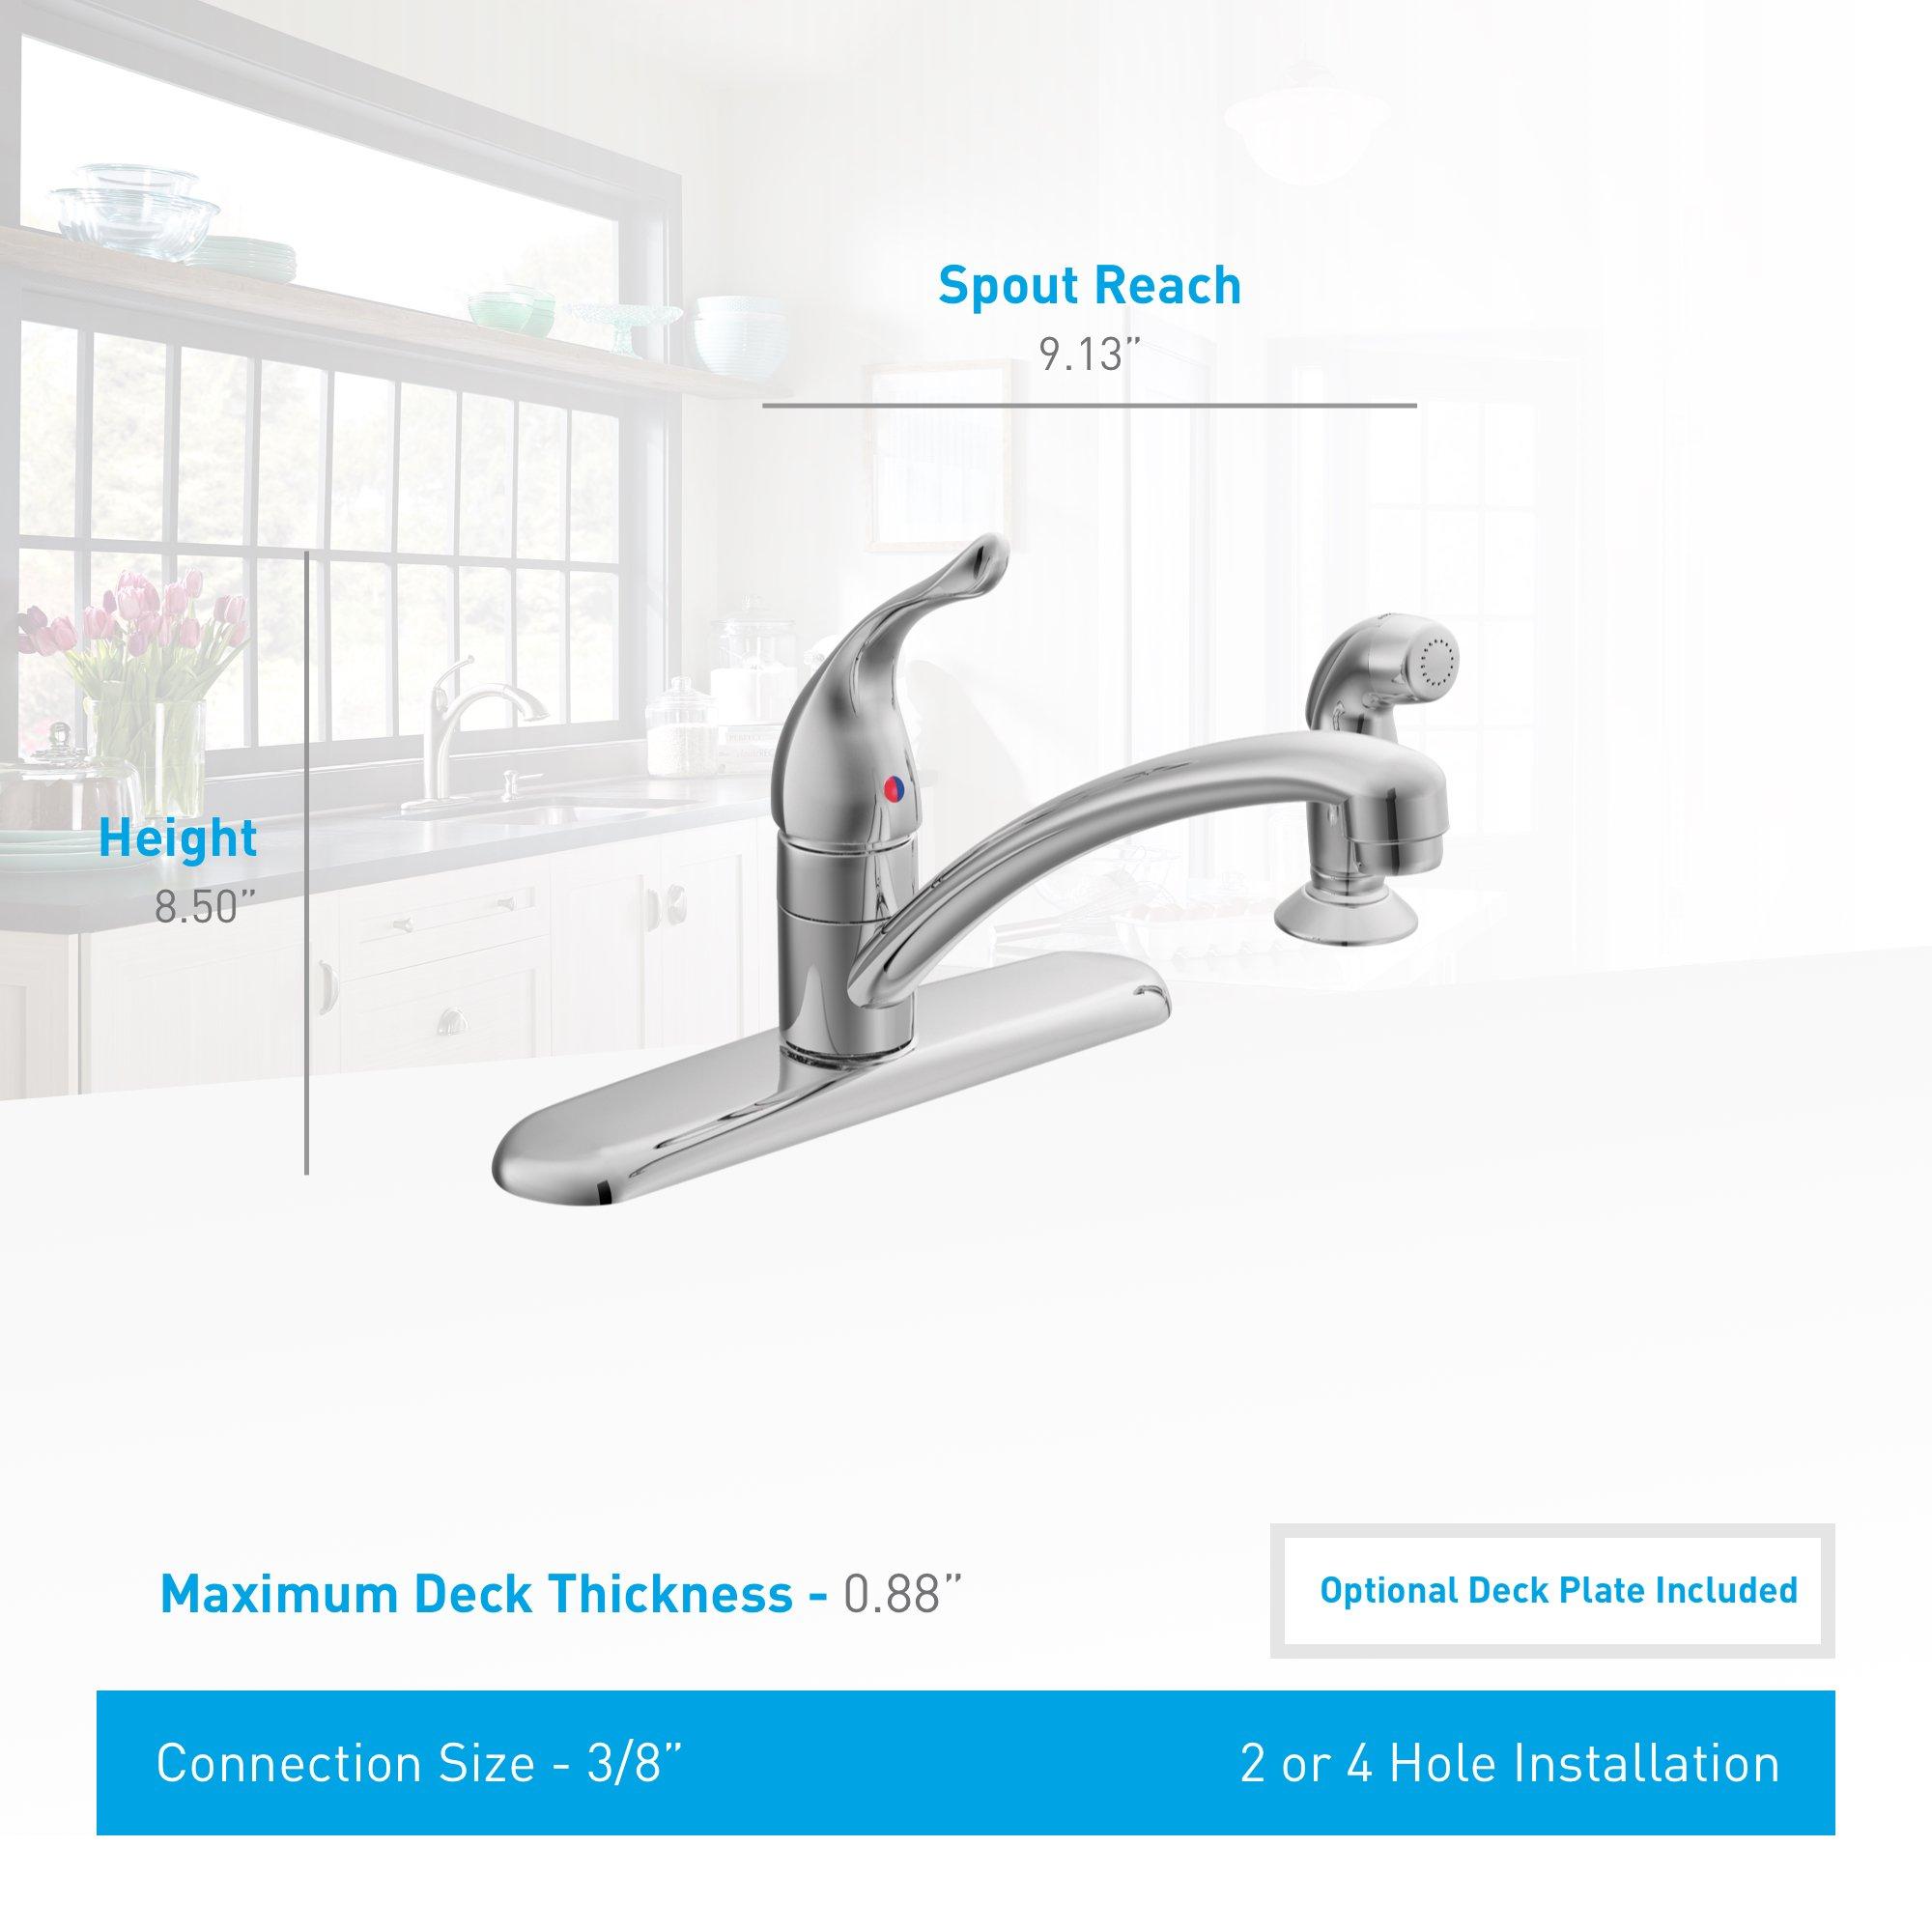 Moen 7430 Chateau One-Handle Low-Arc Kitchen Faucet, Chrome by Moen